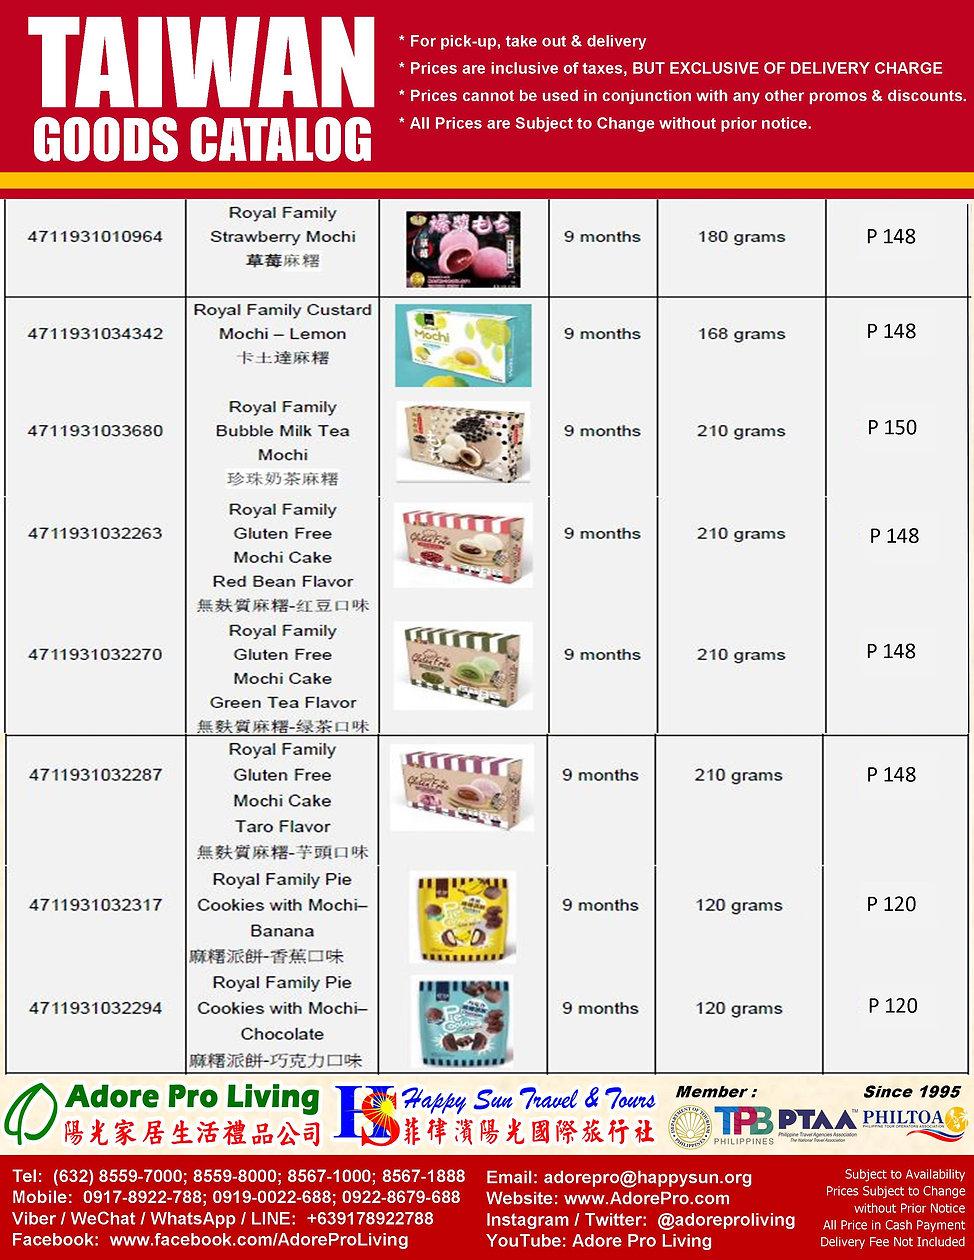 P4_Taiwan Goods Catalog_202009119.jpg